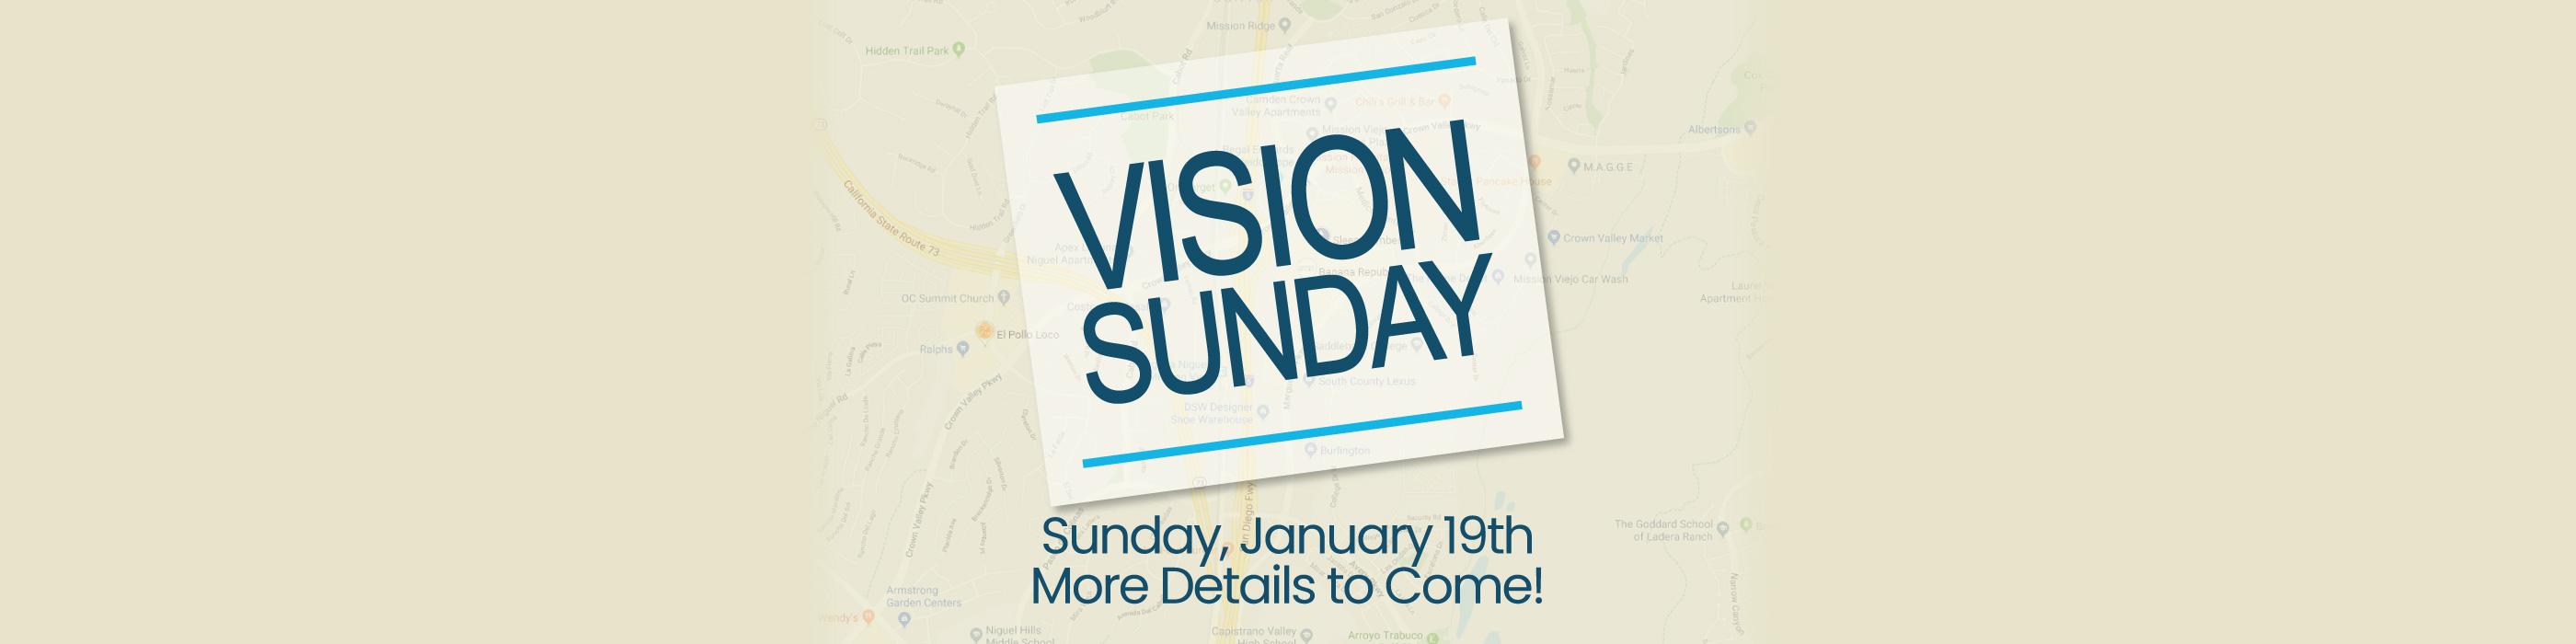 Summit-Vision-Sunday-011920-WEB-2800x700